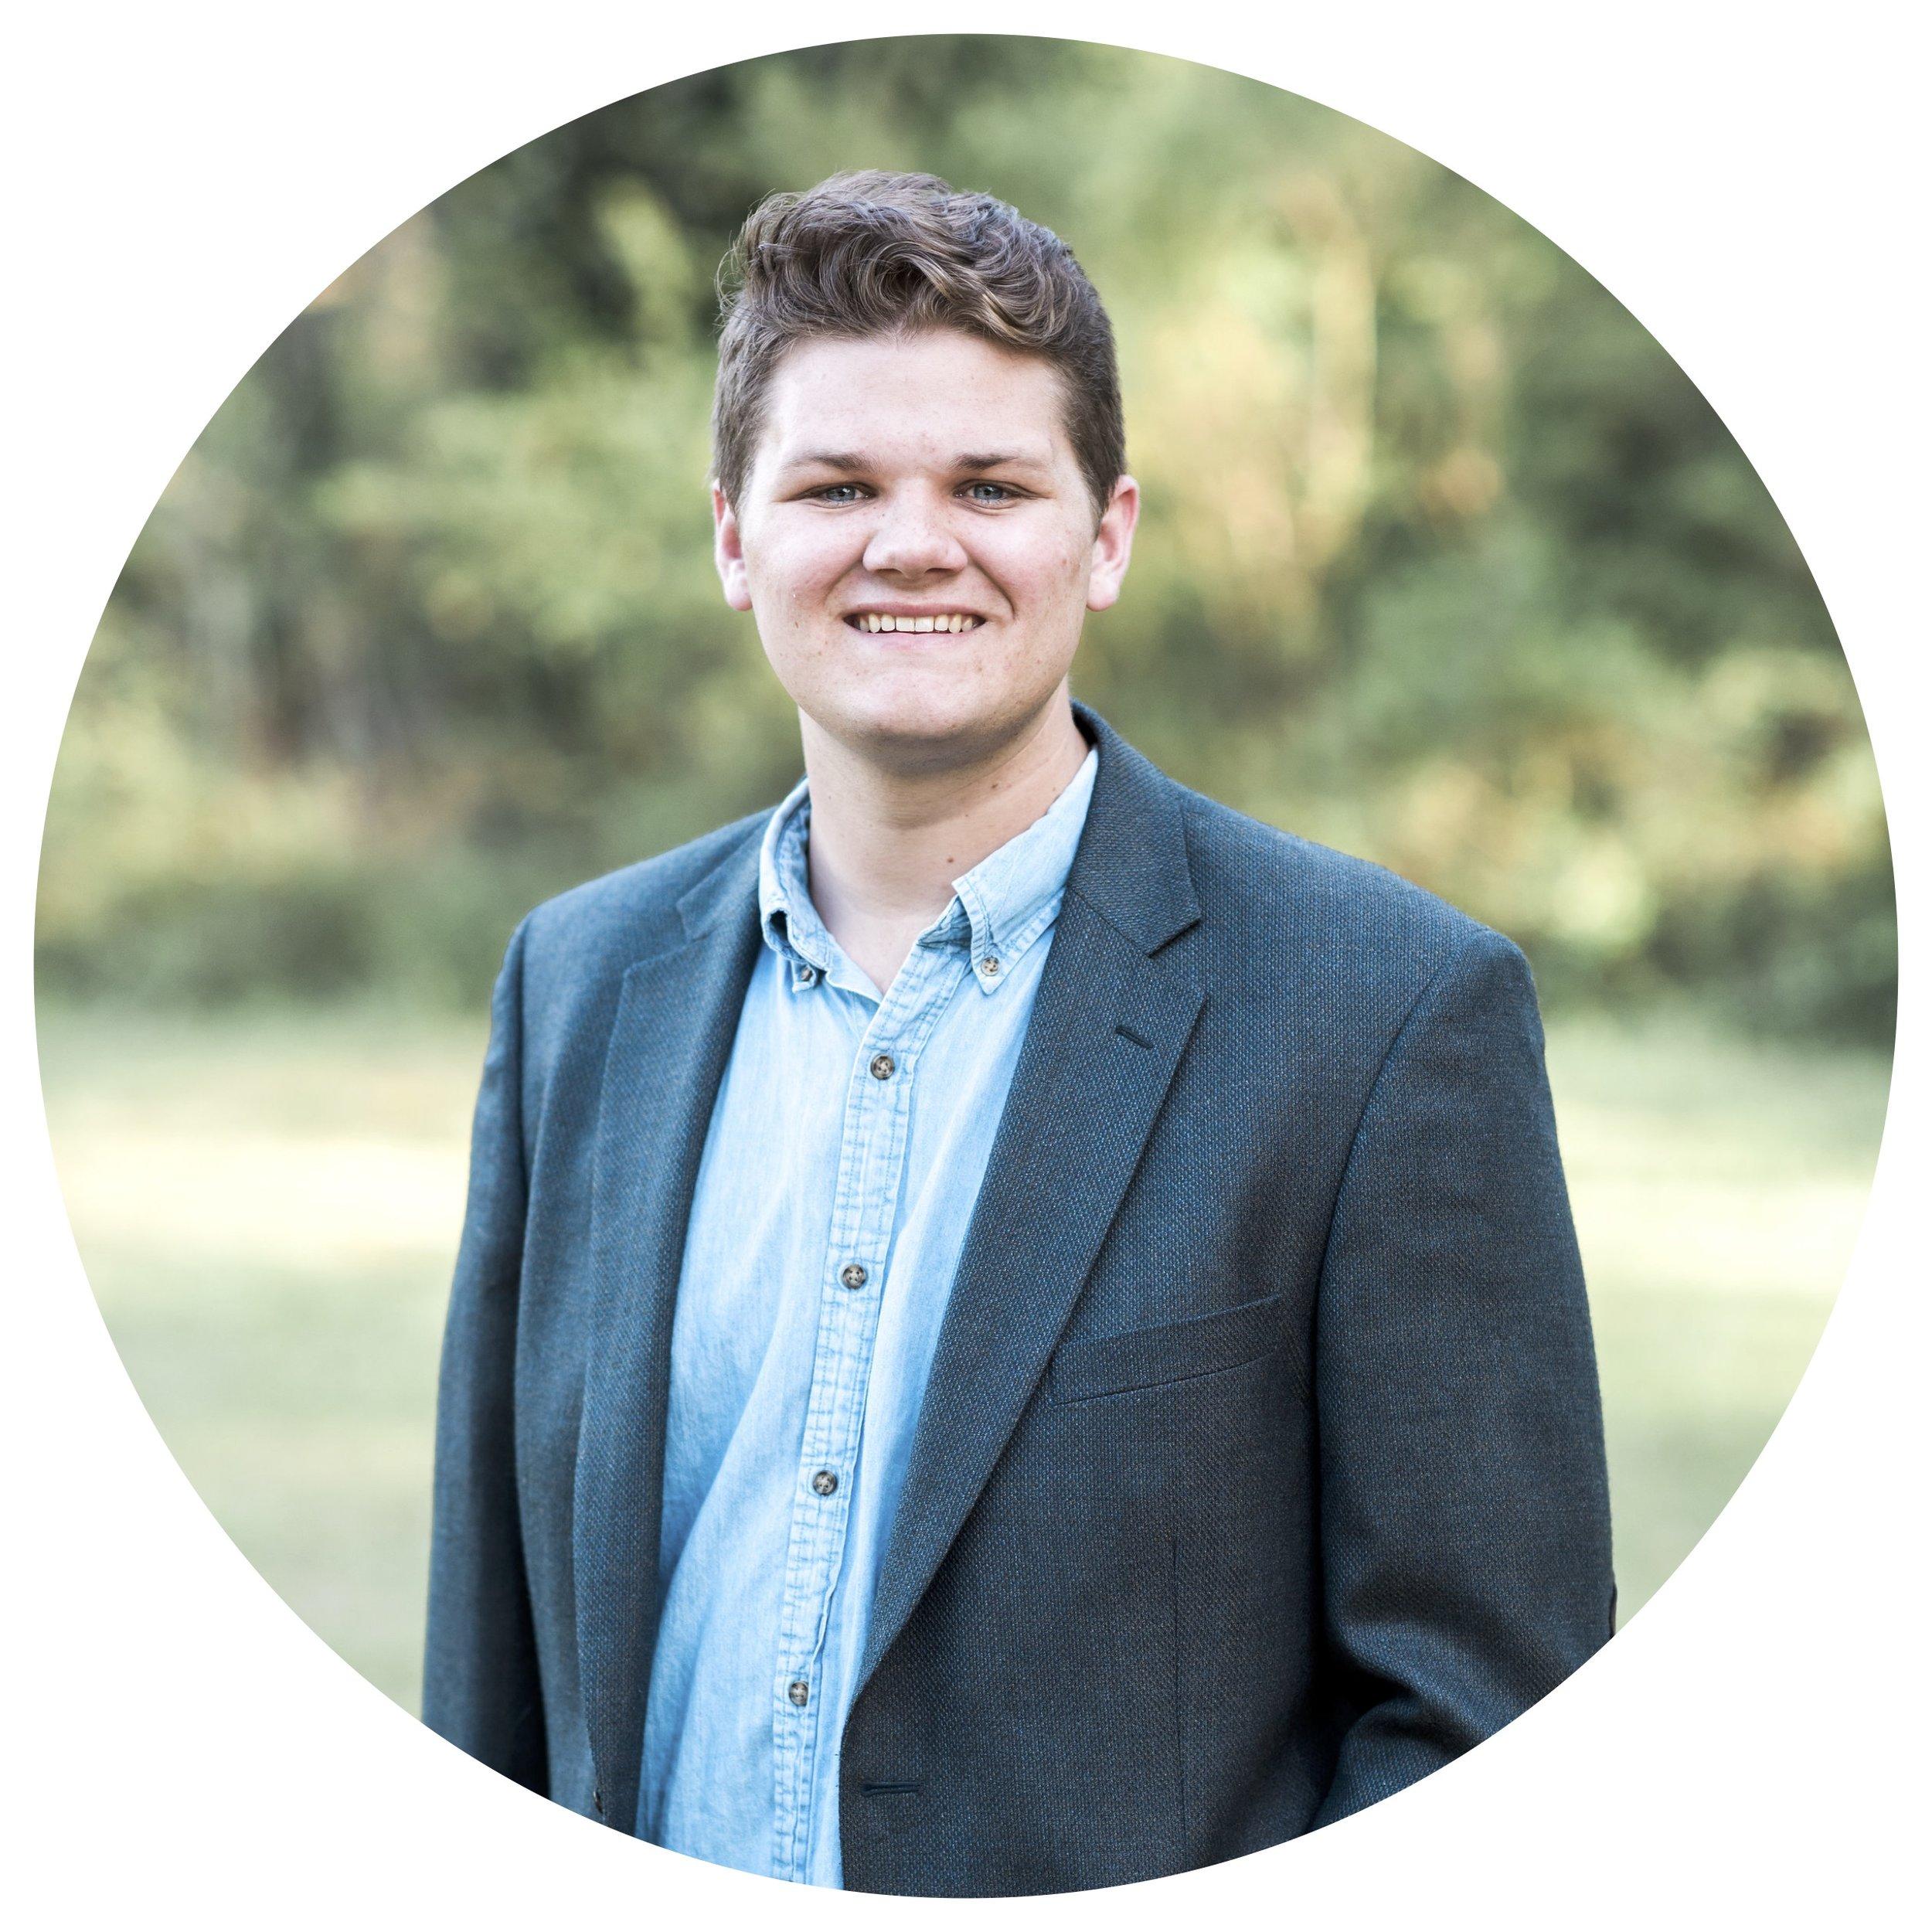 LOGAN STEPHENS  Co-Founder, Chief Brand Officer  Logan@helpfeedserve.org